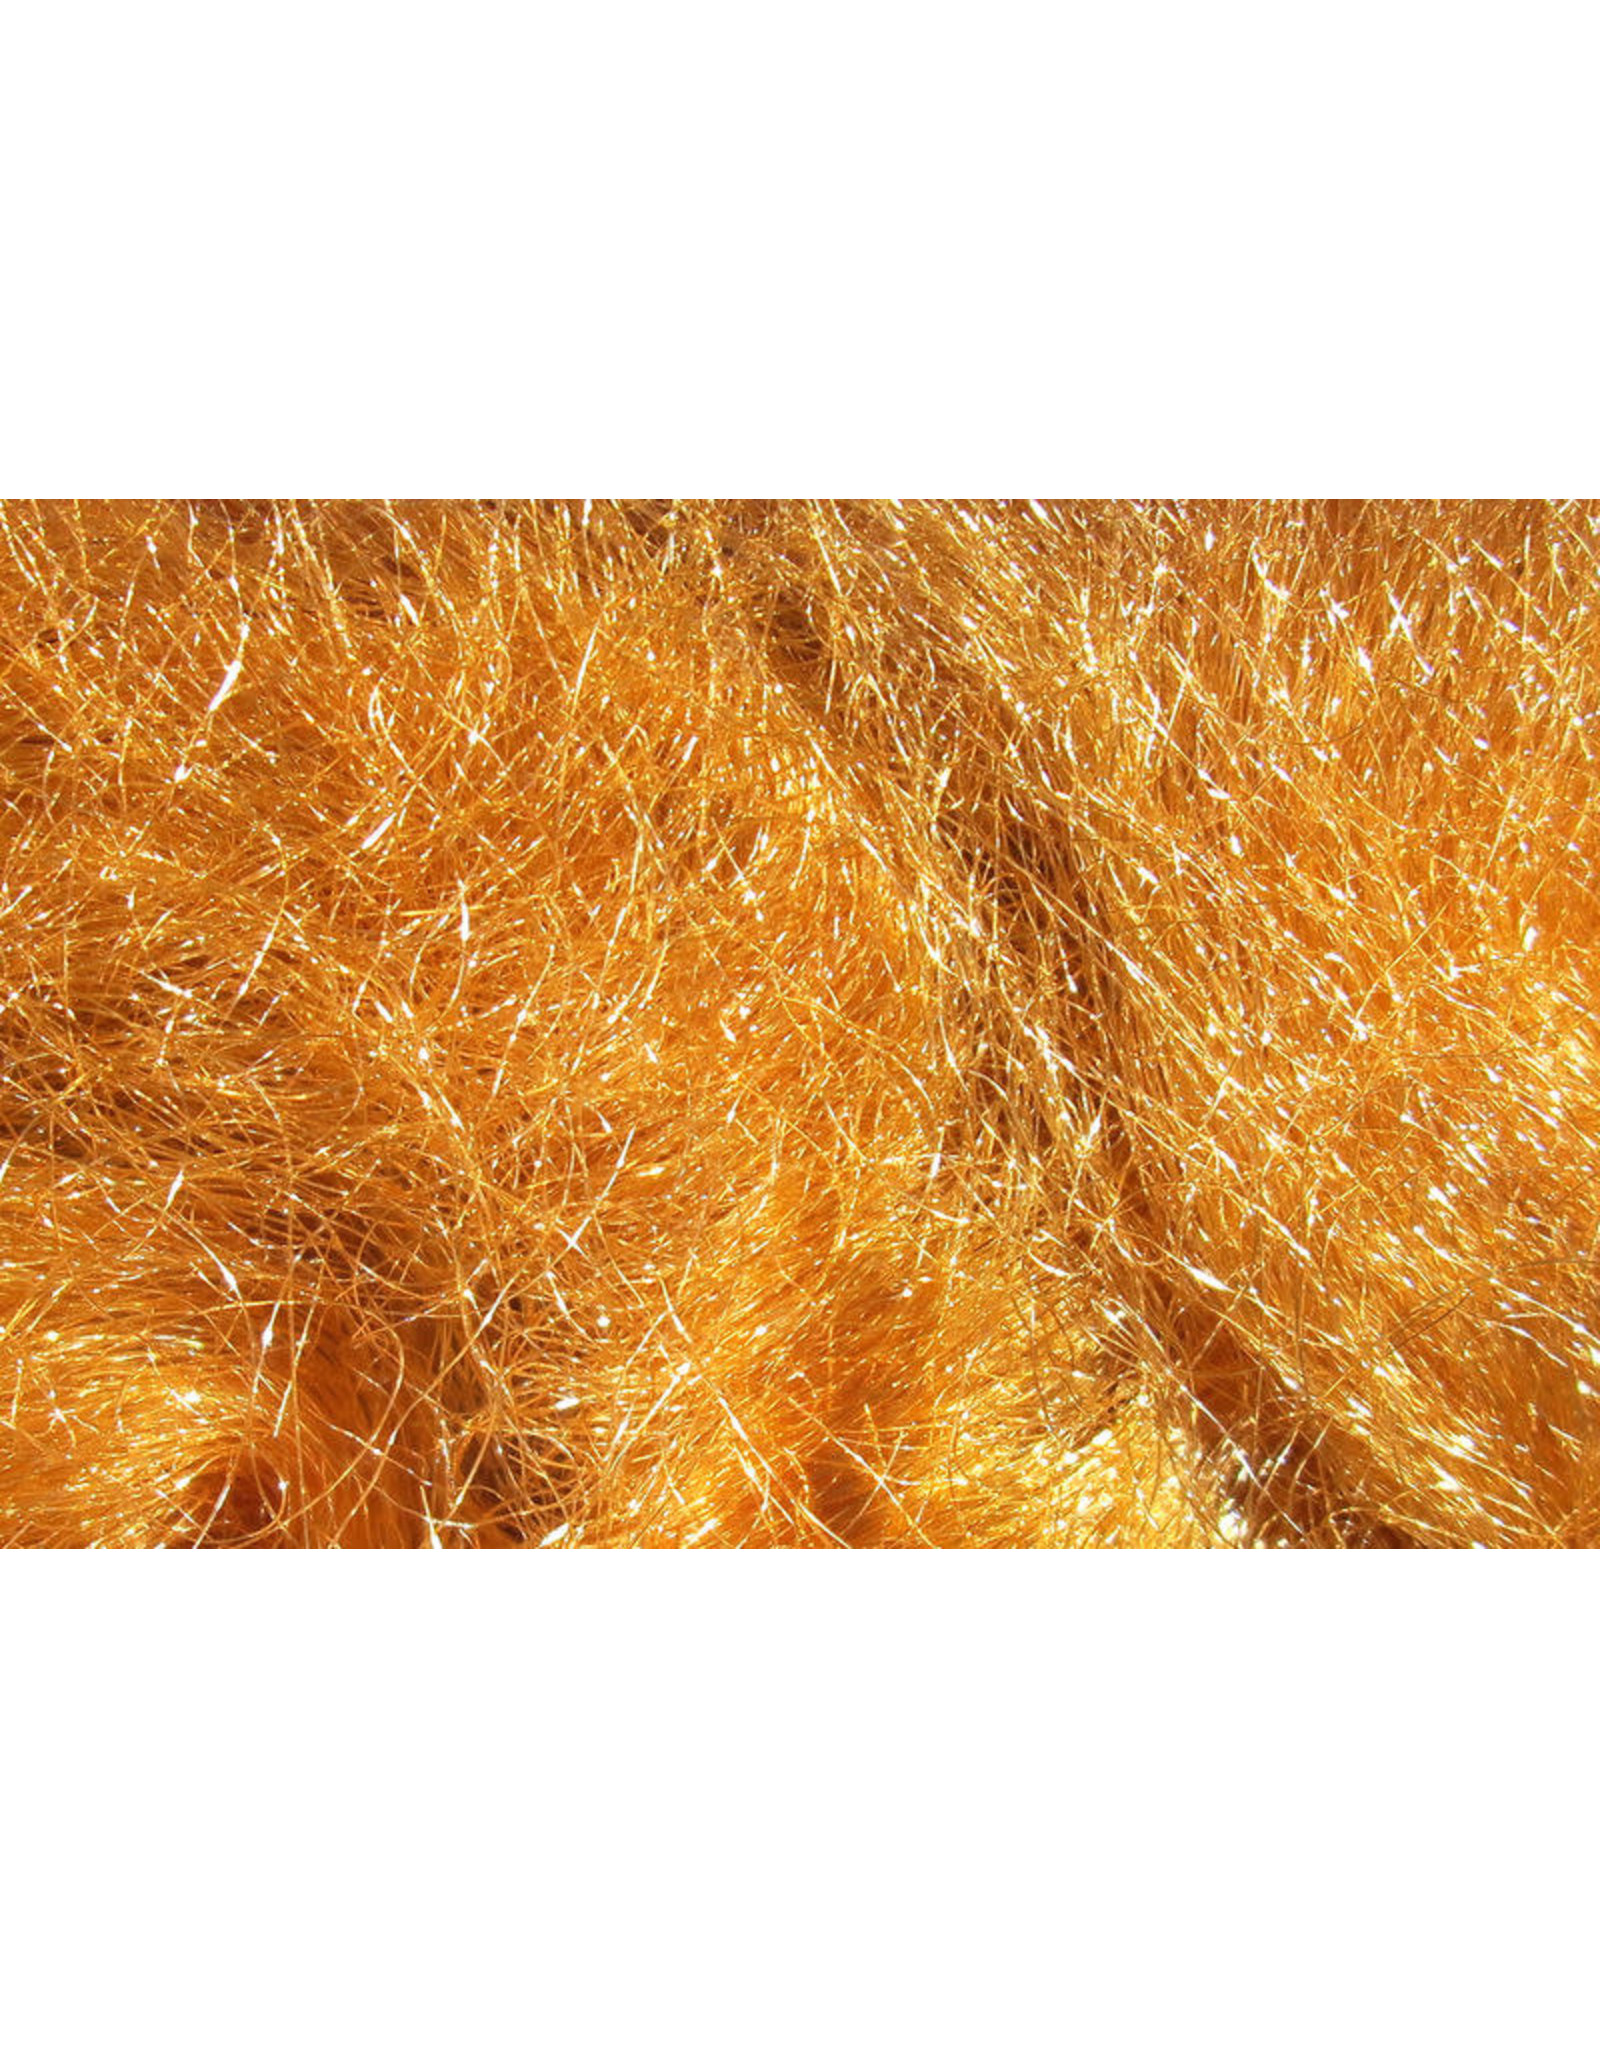 Hareline Dubbin Senyo's Laser Hair 4.0